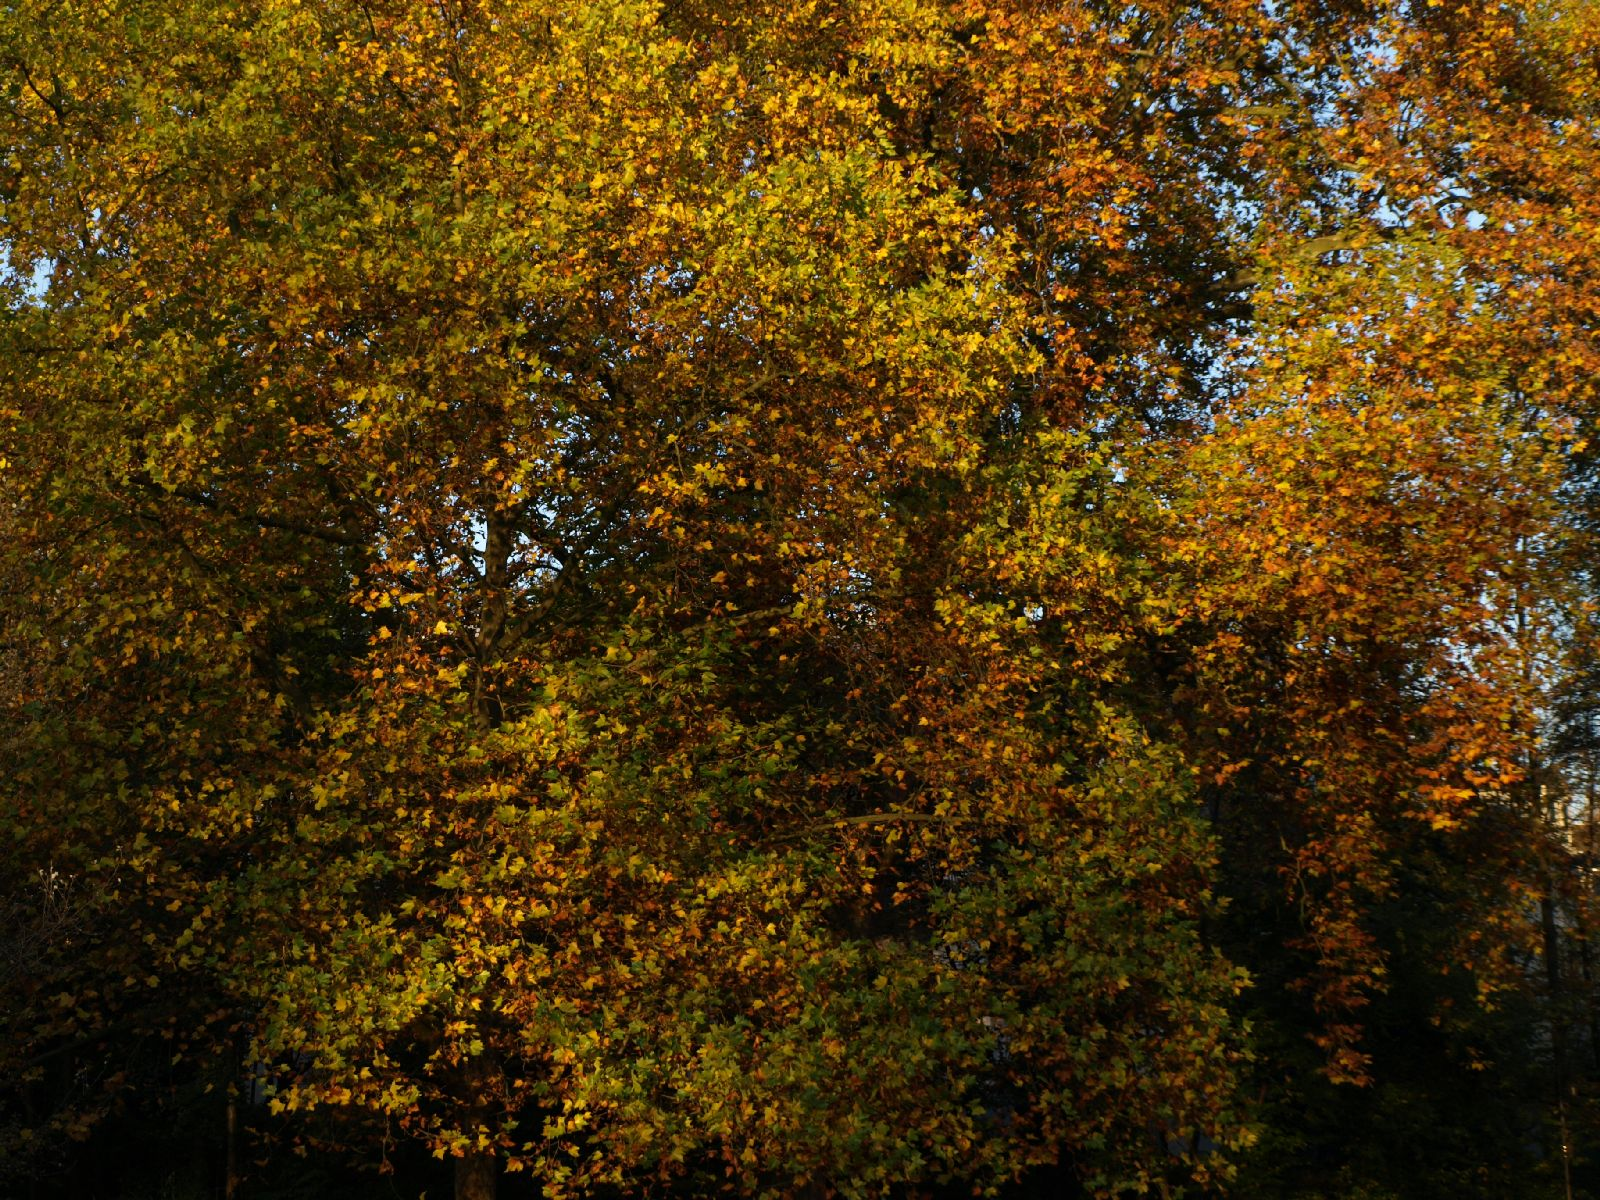 Pflanzen-Baum-Foto_Textur_B_PA256302